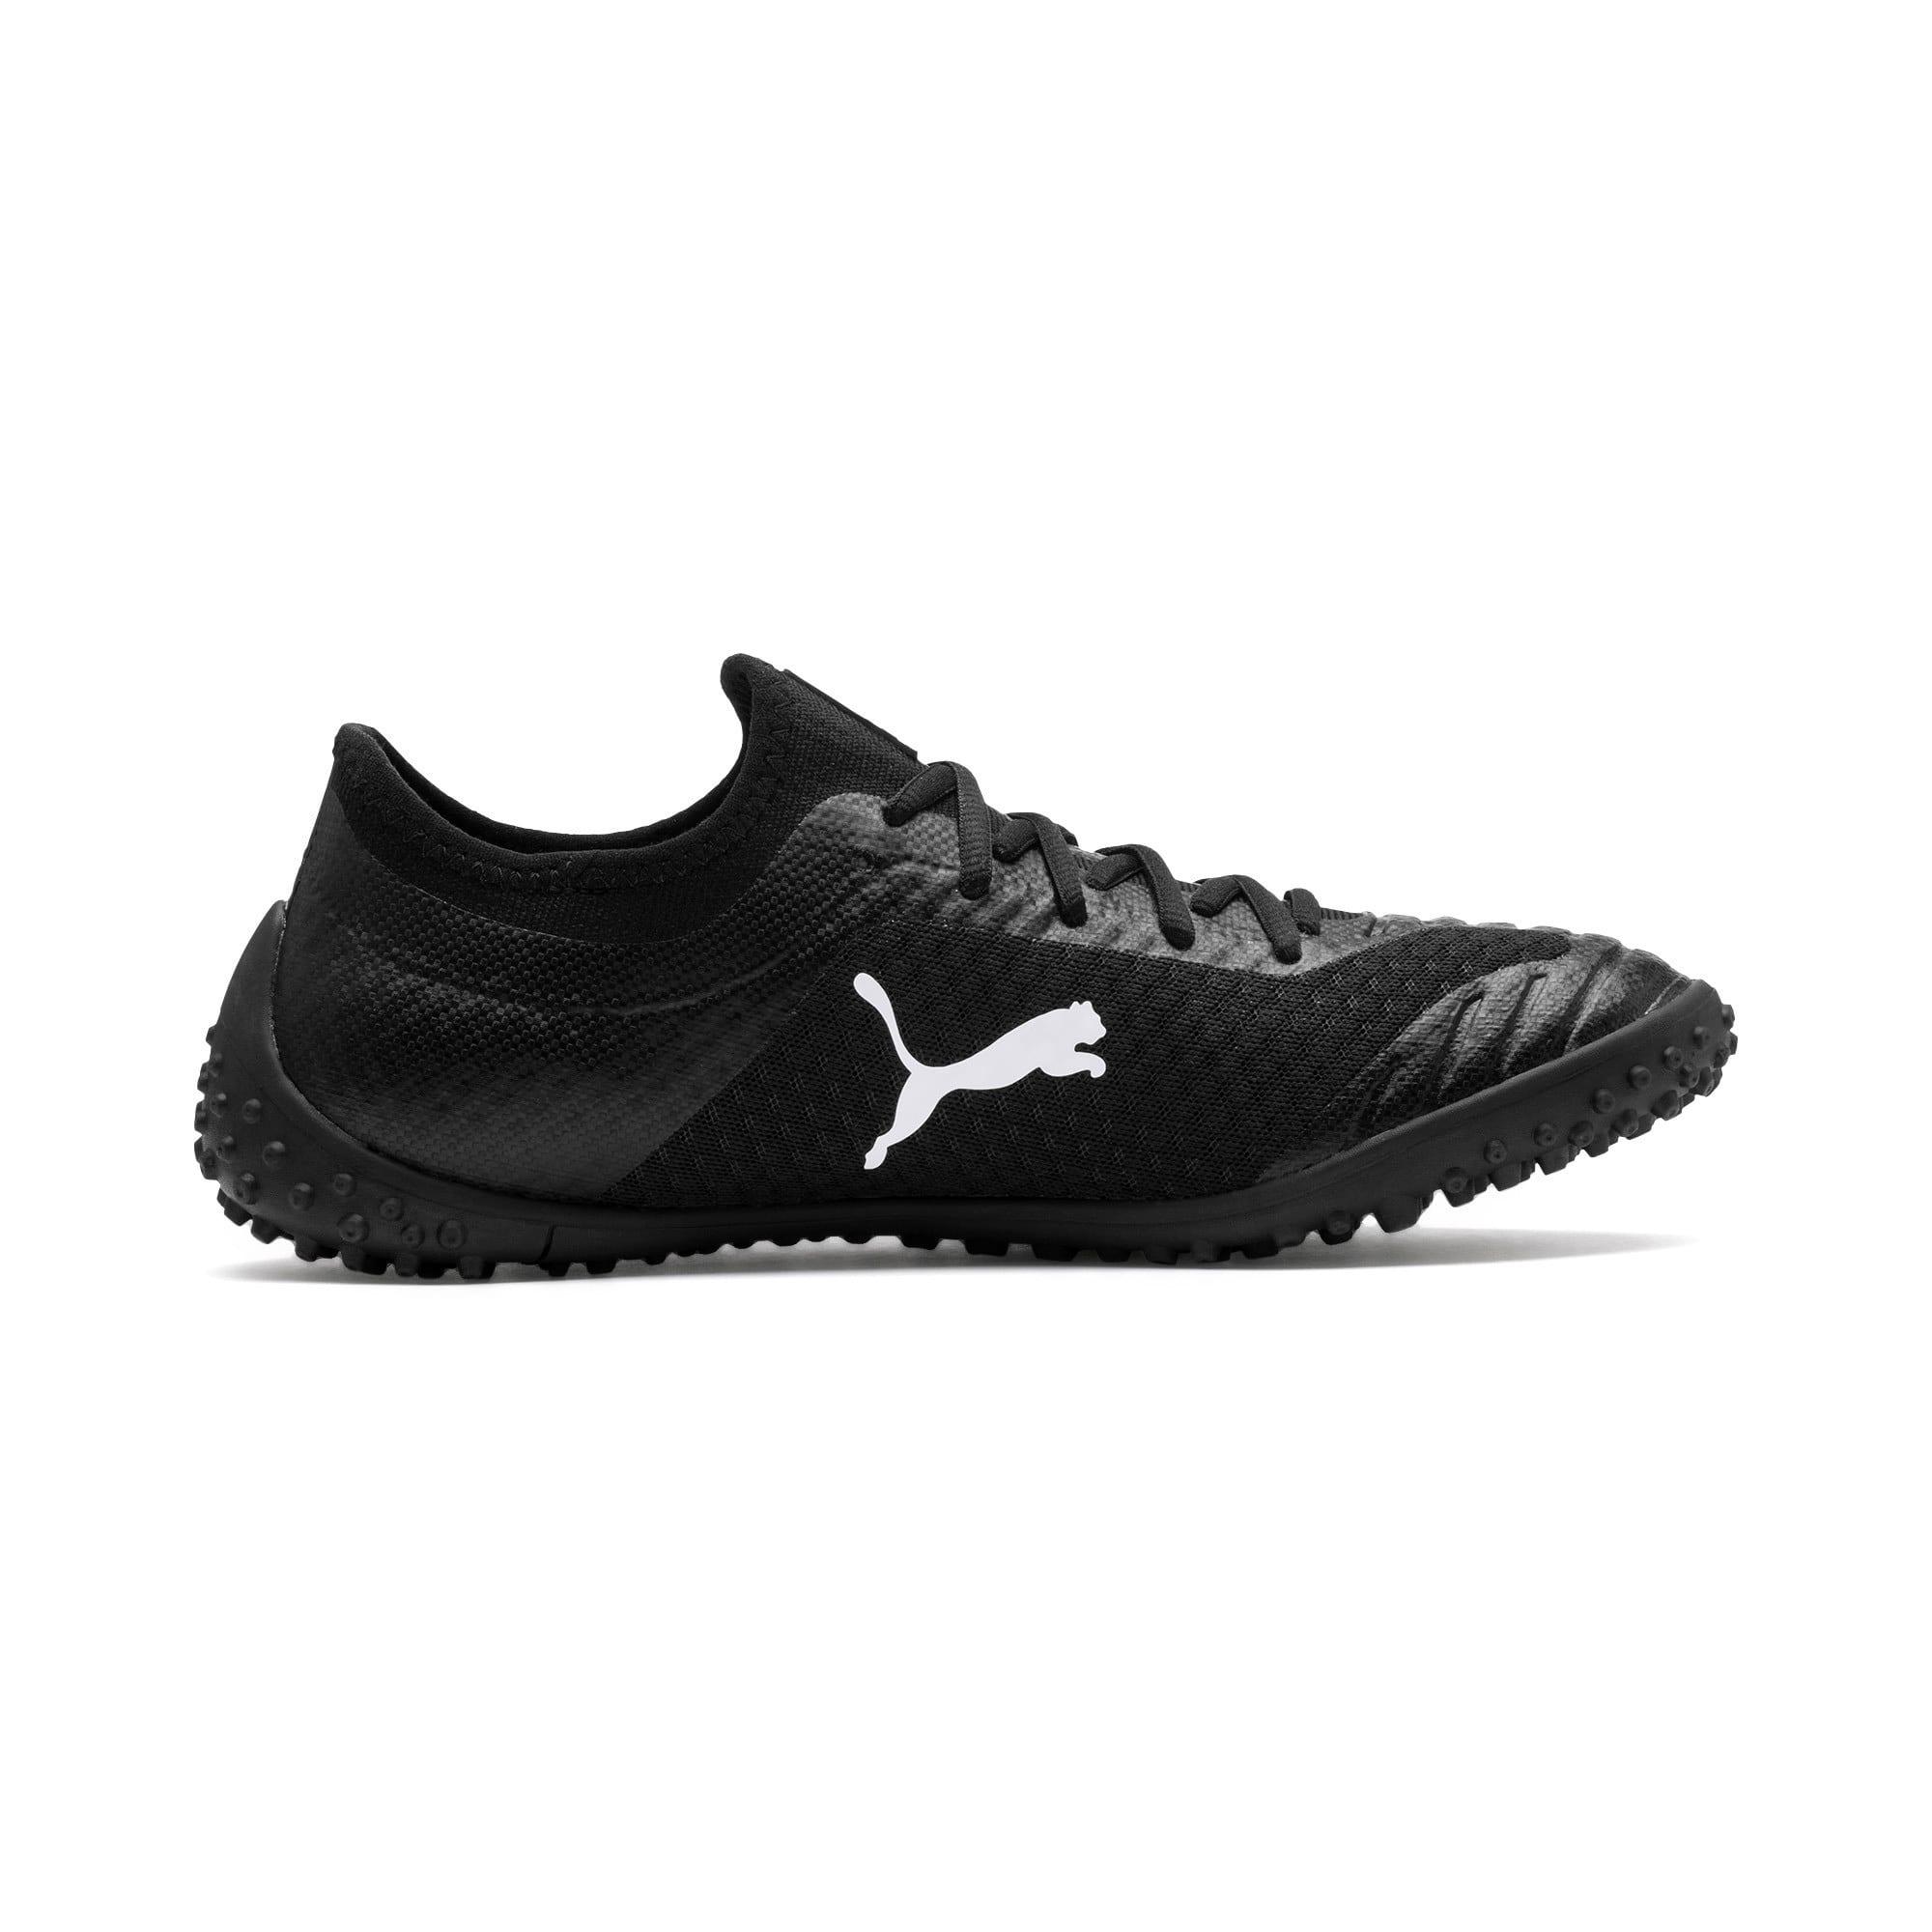 Thumbnail 6 of 365 Concrete 2 Men's Football Boots, Puma Black-Puma White, medium